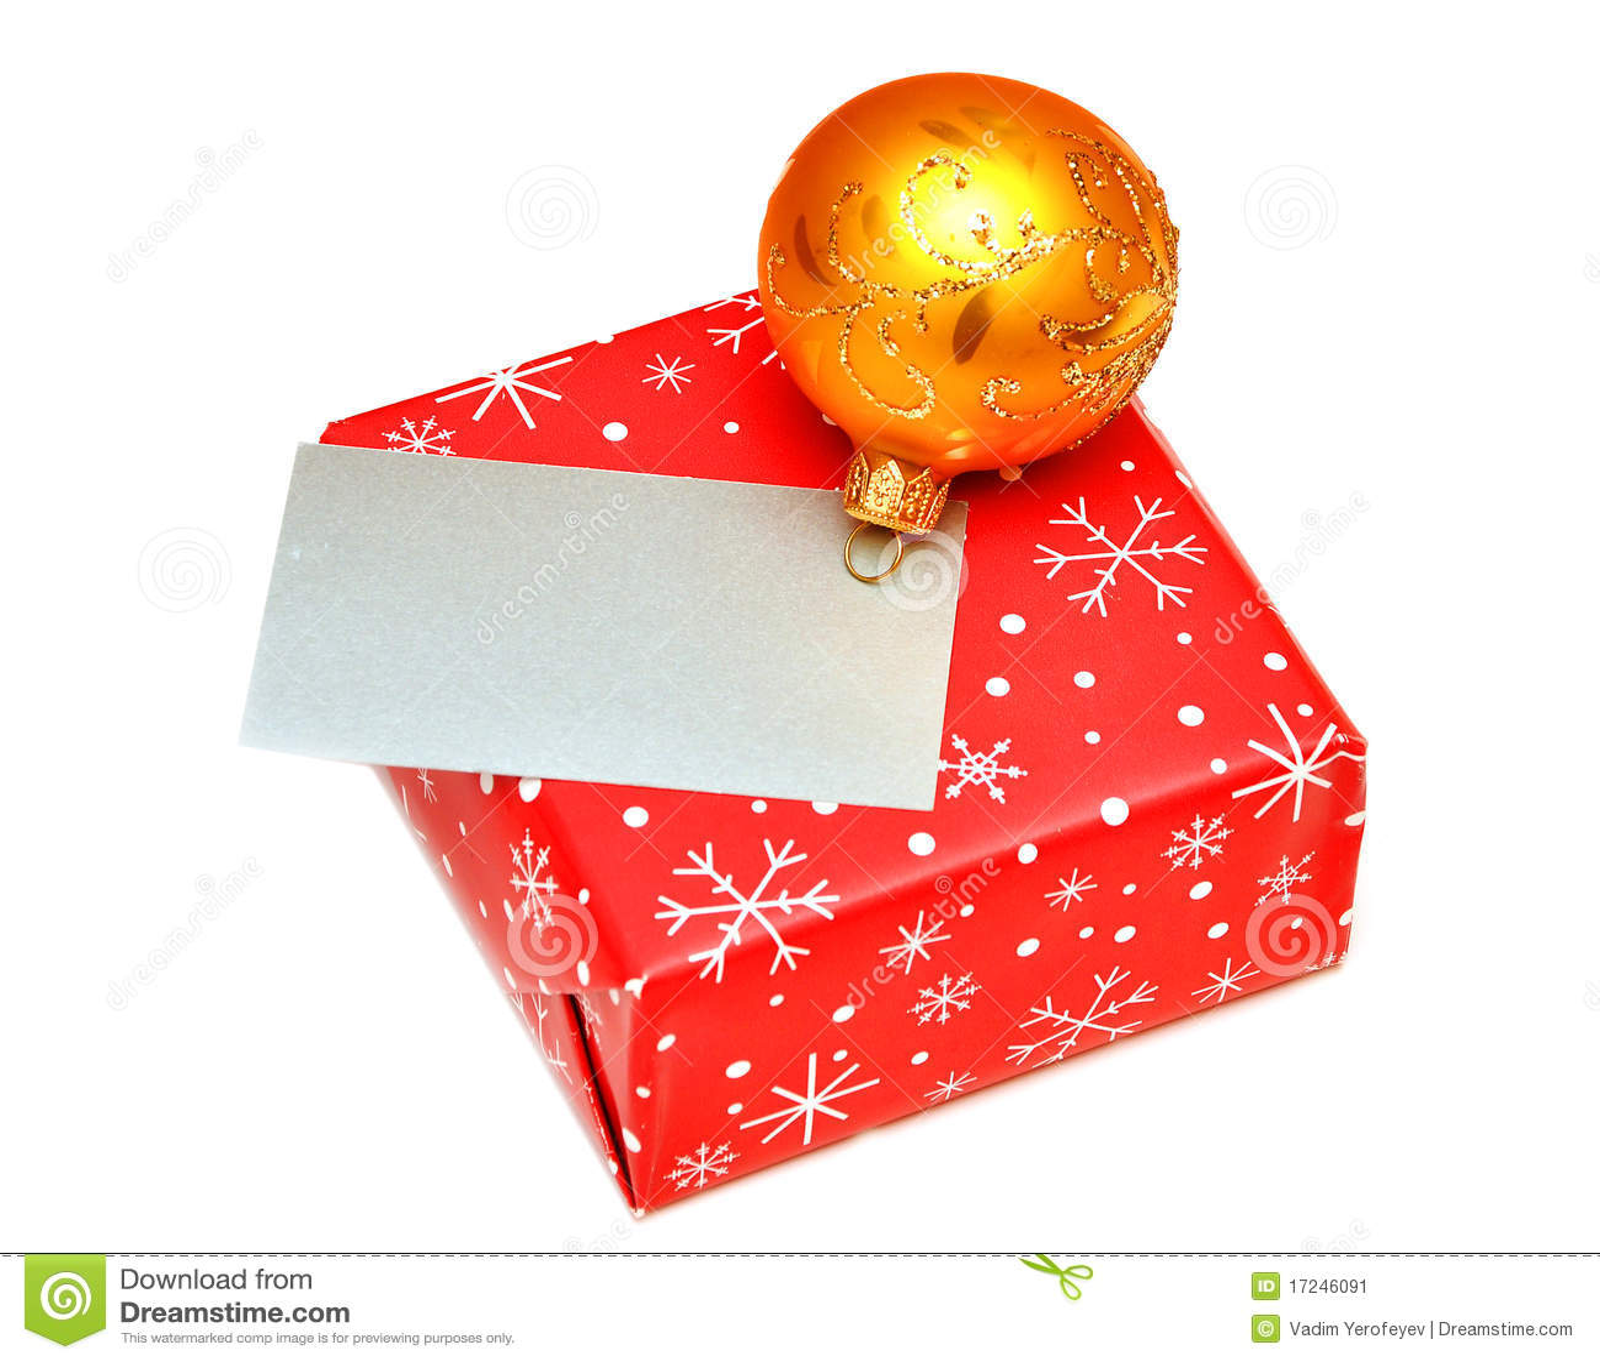 Blank greeting card or gift on christmas box stock